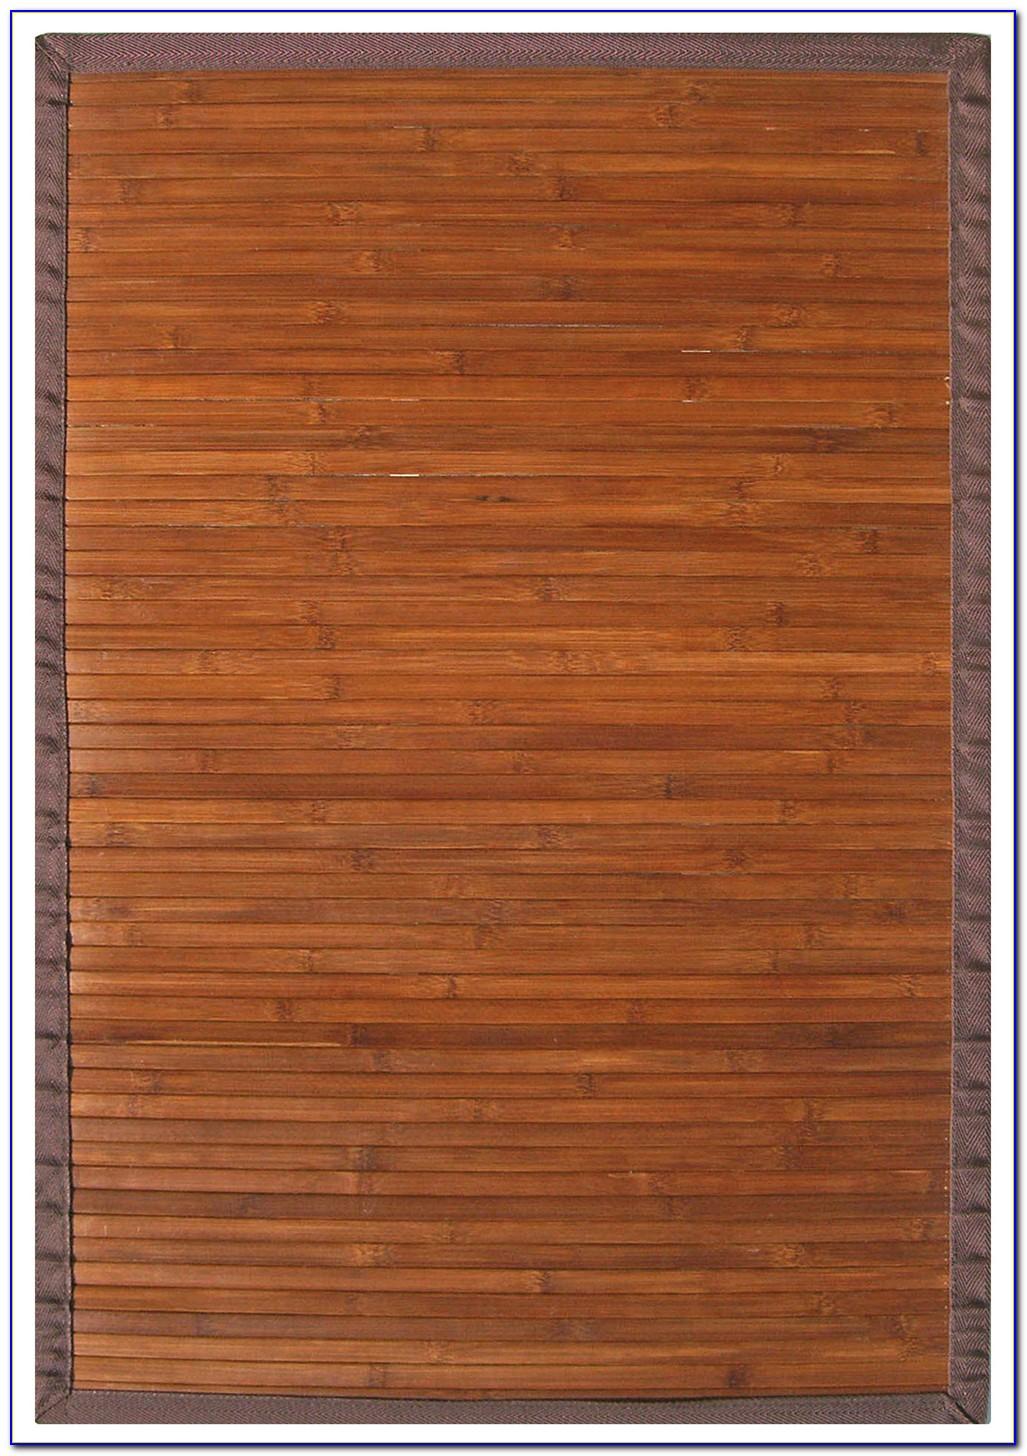 Bamboo Area Rug 5x8